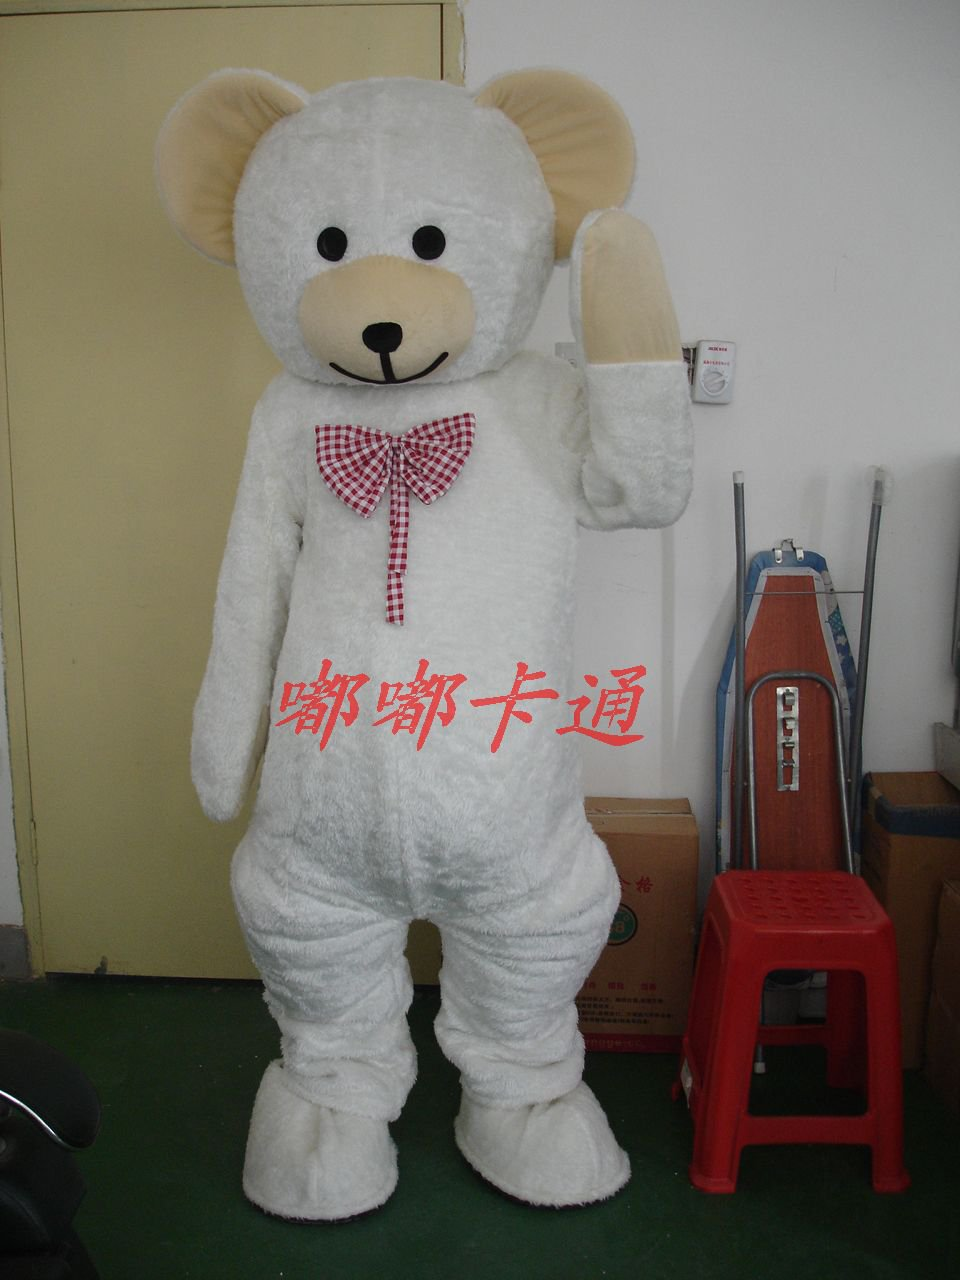 Cartoon Doll Clothing Stage Performance Clothing Cartoon Polar Bear Plush Toys Cartoon Costumes Mascot Costume